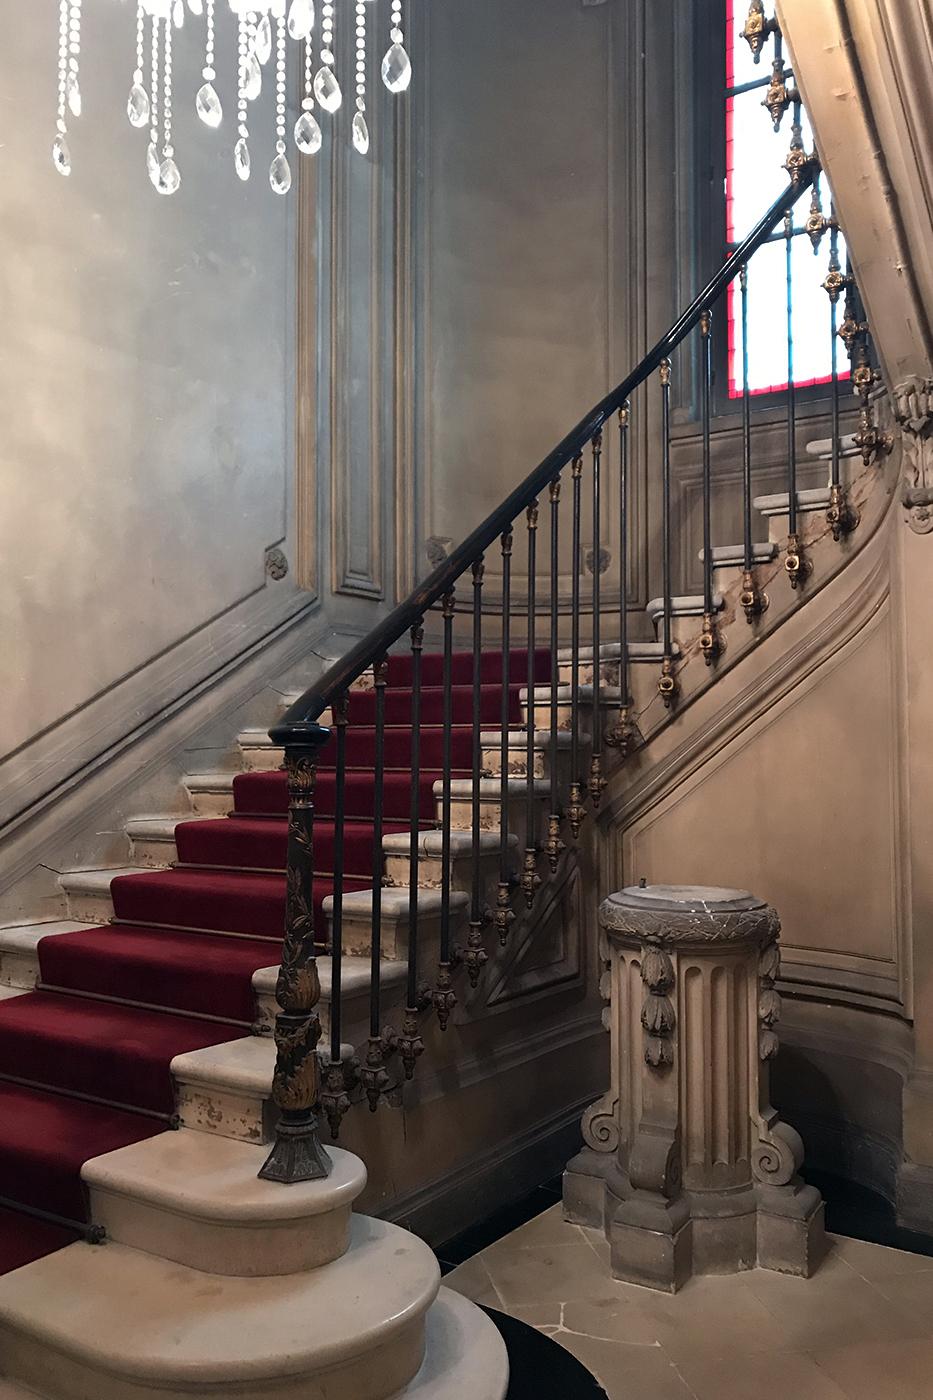 LE BLOG SORSLUXE escaliers de varenne.jpg